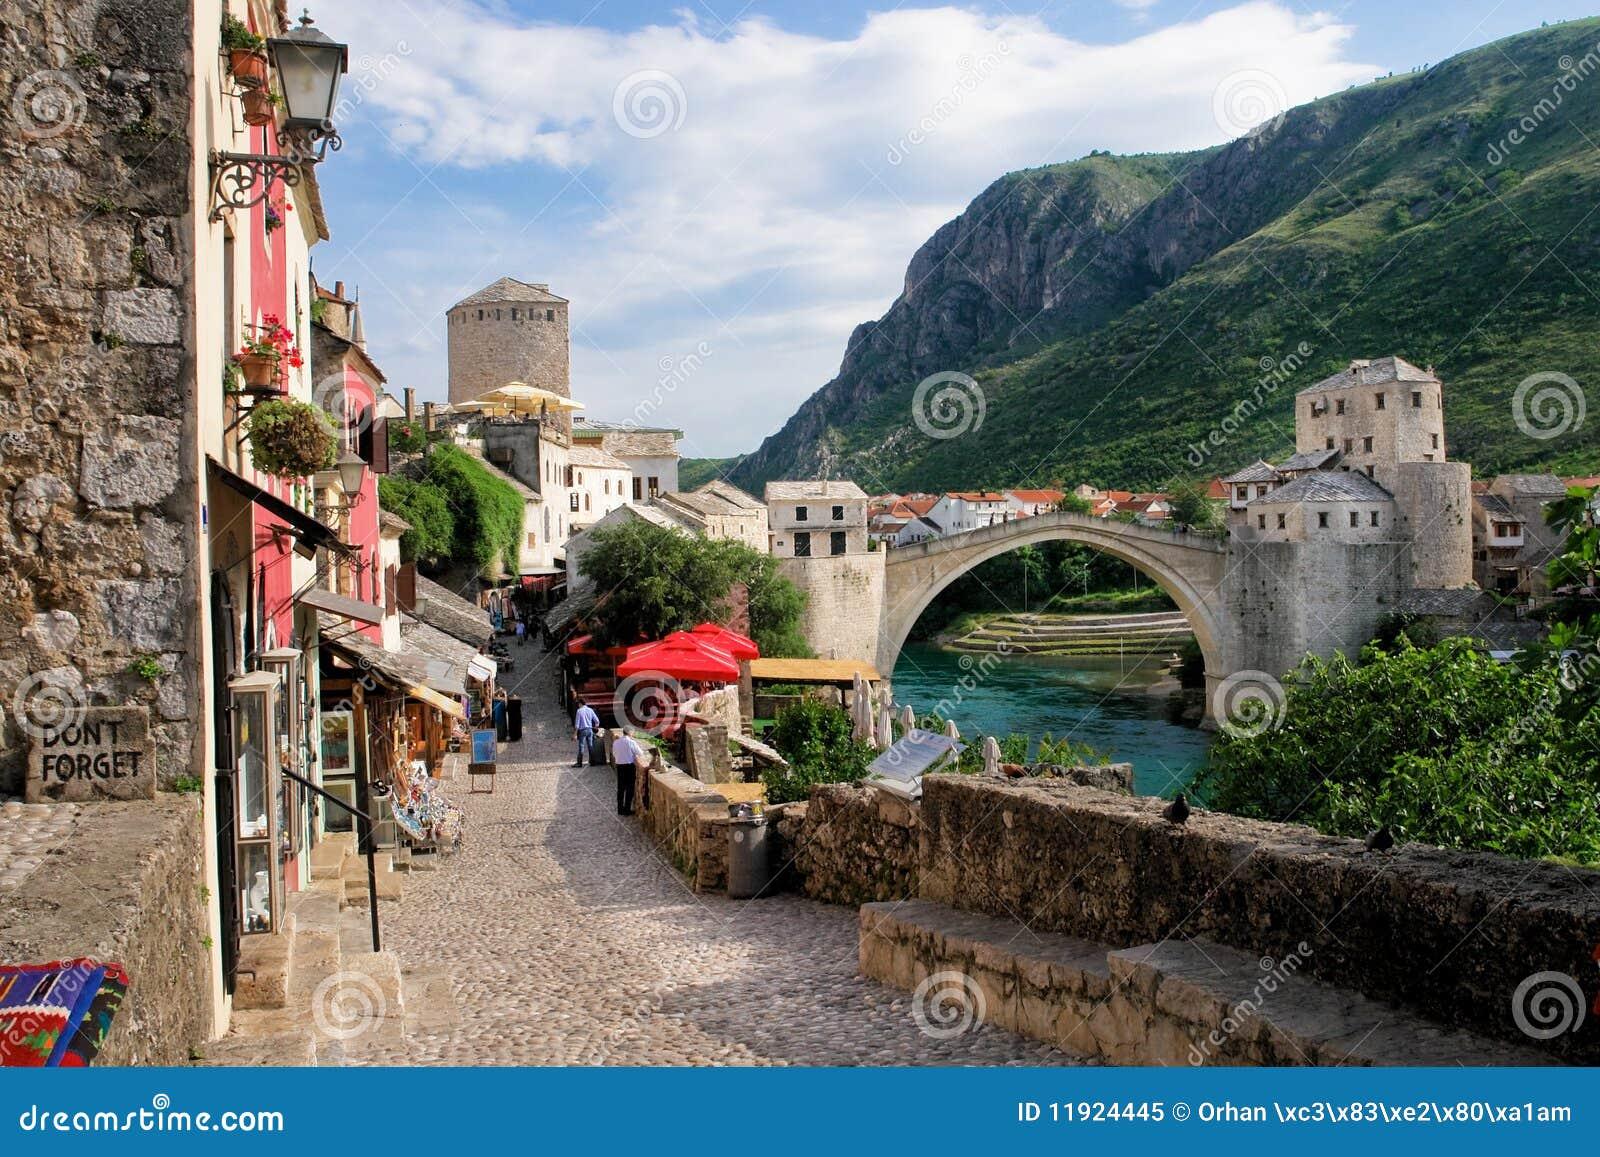 Bosnia Herzegovina - Mostar